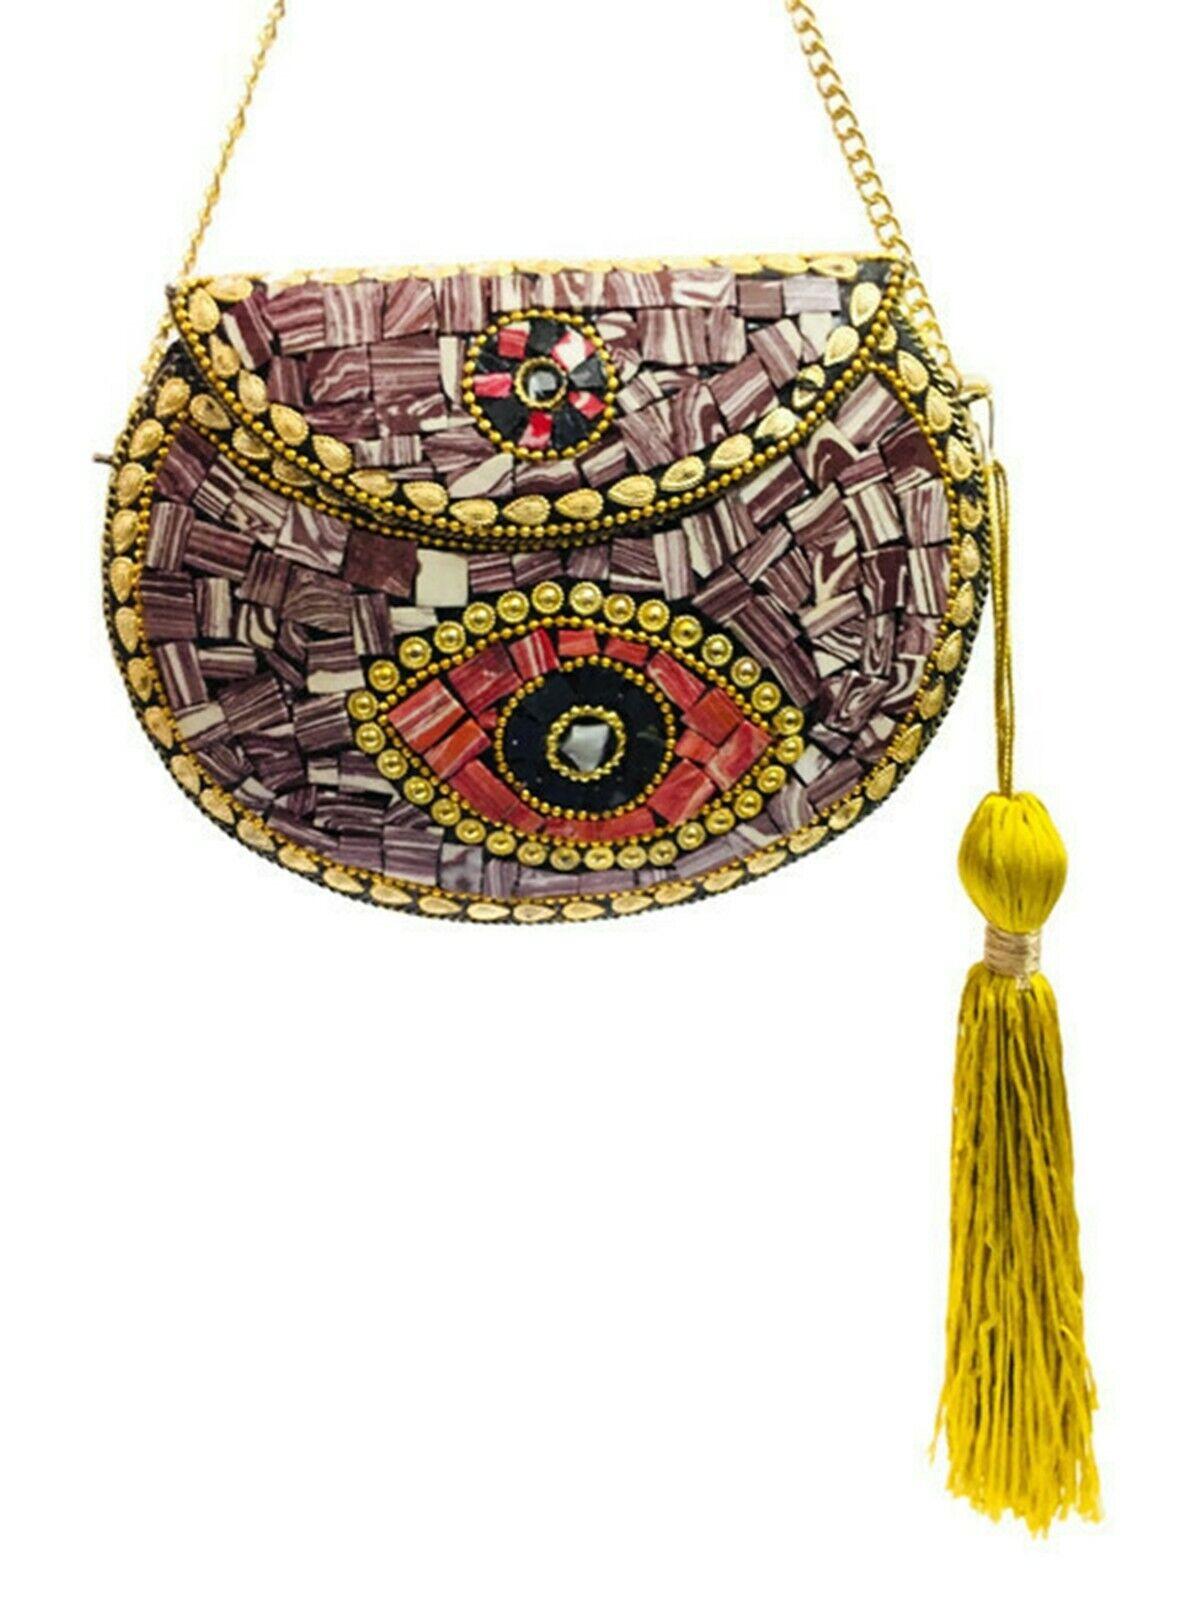 Tassels bag metal clutch Indian Ethnic Metal Bag mosaic clutch Antique Wallets